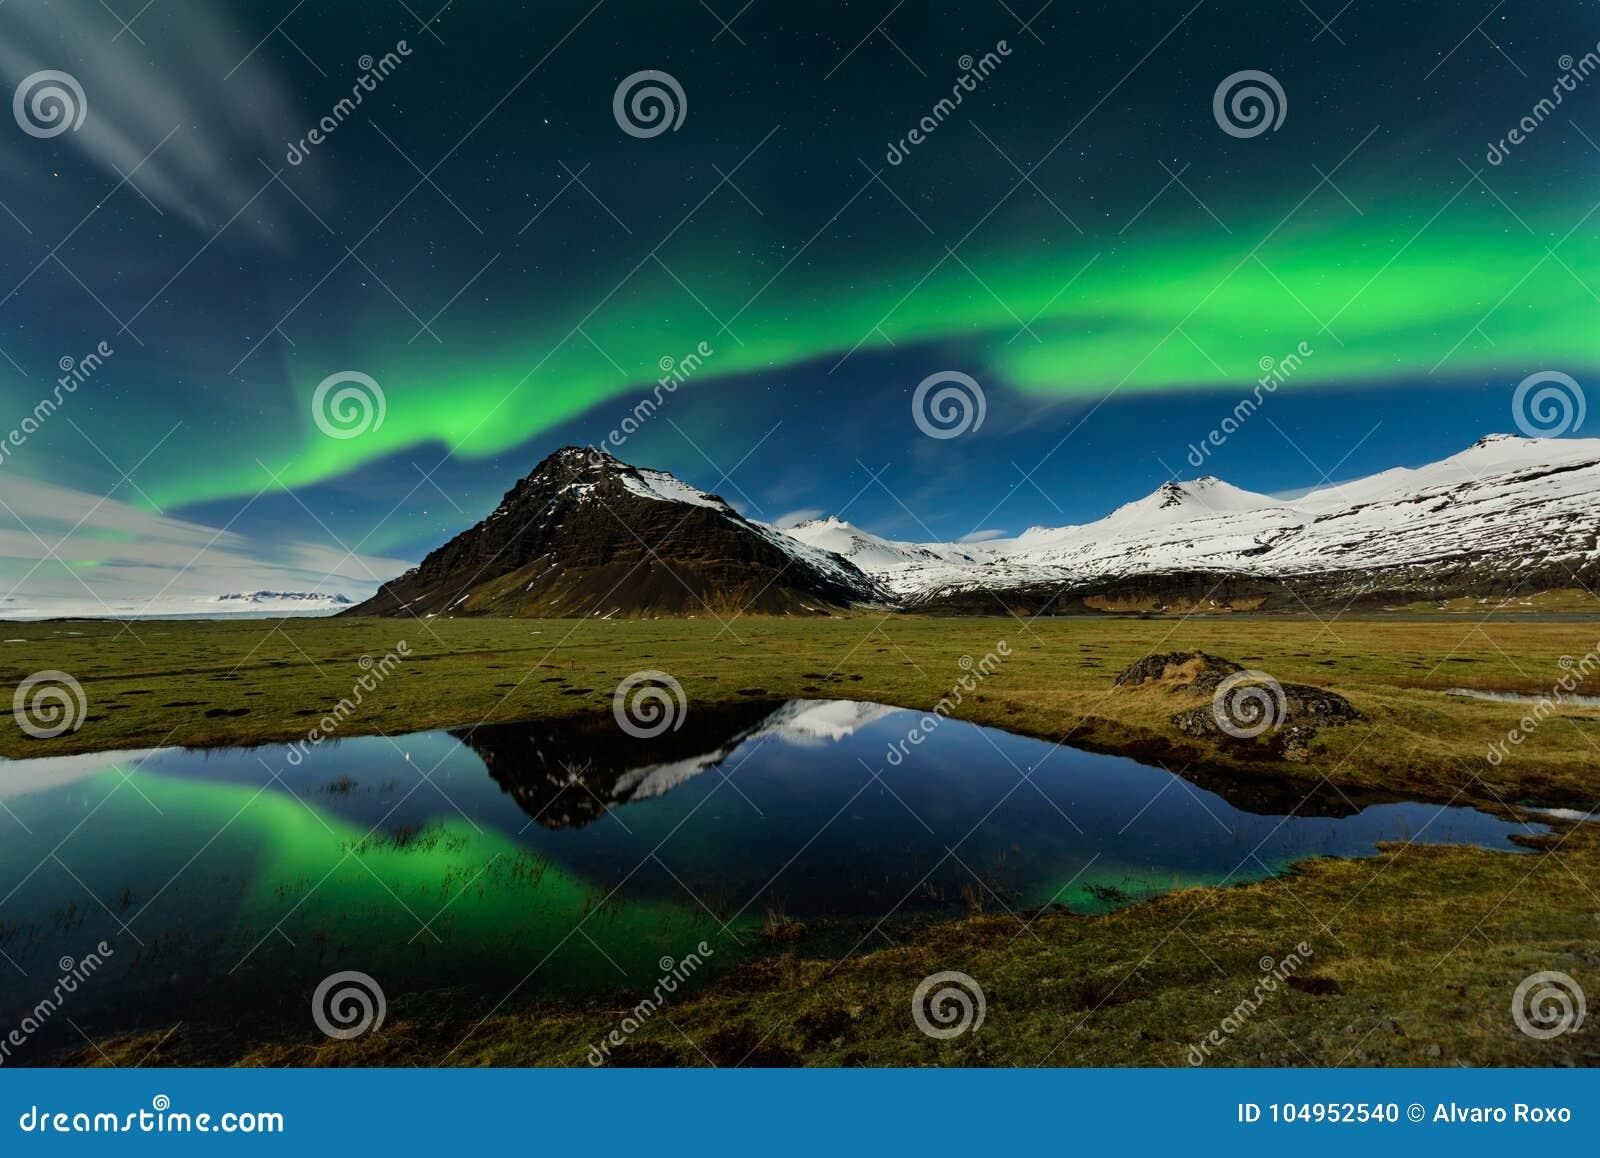 Verbazende Aurora Borealis in de hemel van IJsland